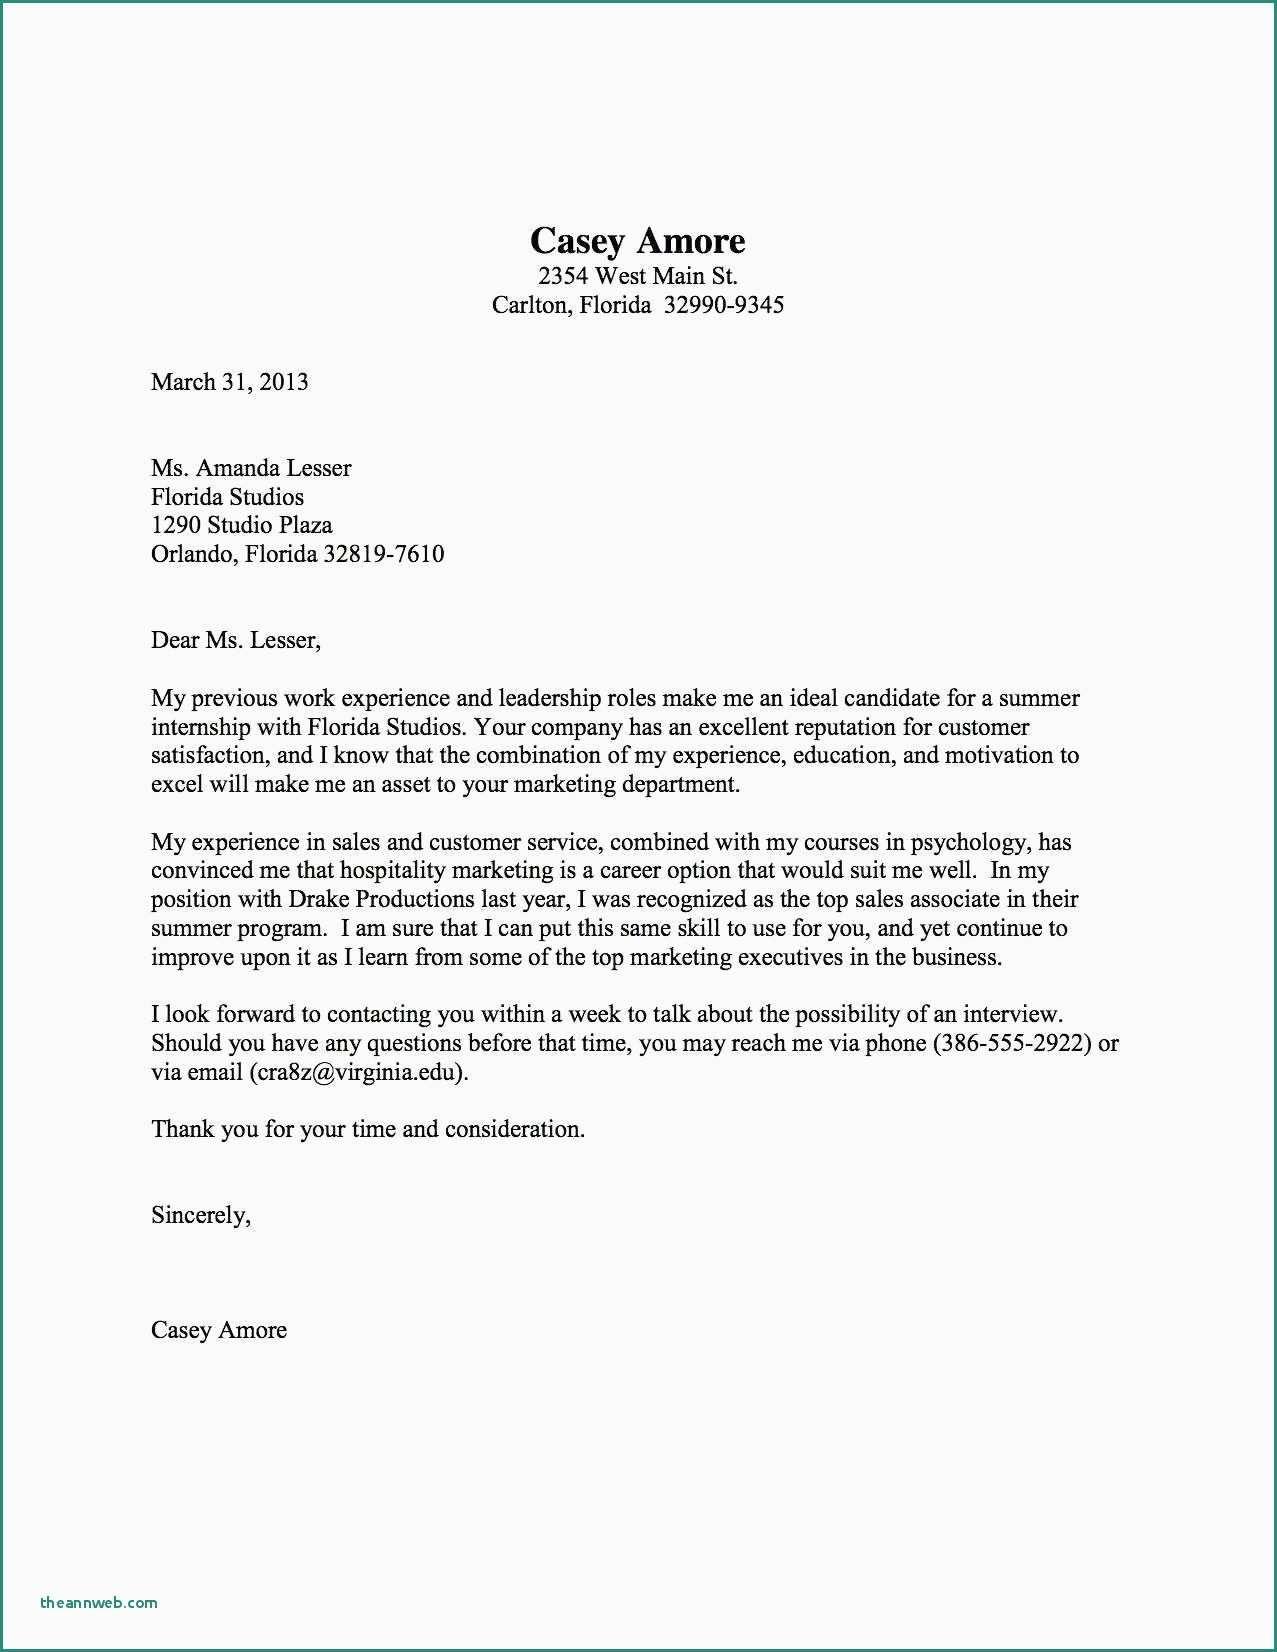 26 Career Change Cover Letter Sample In 2020 Resume Cover